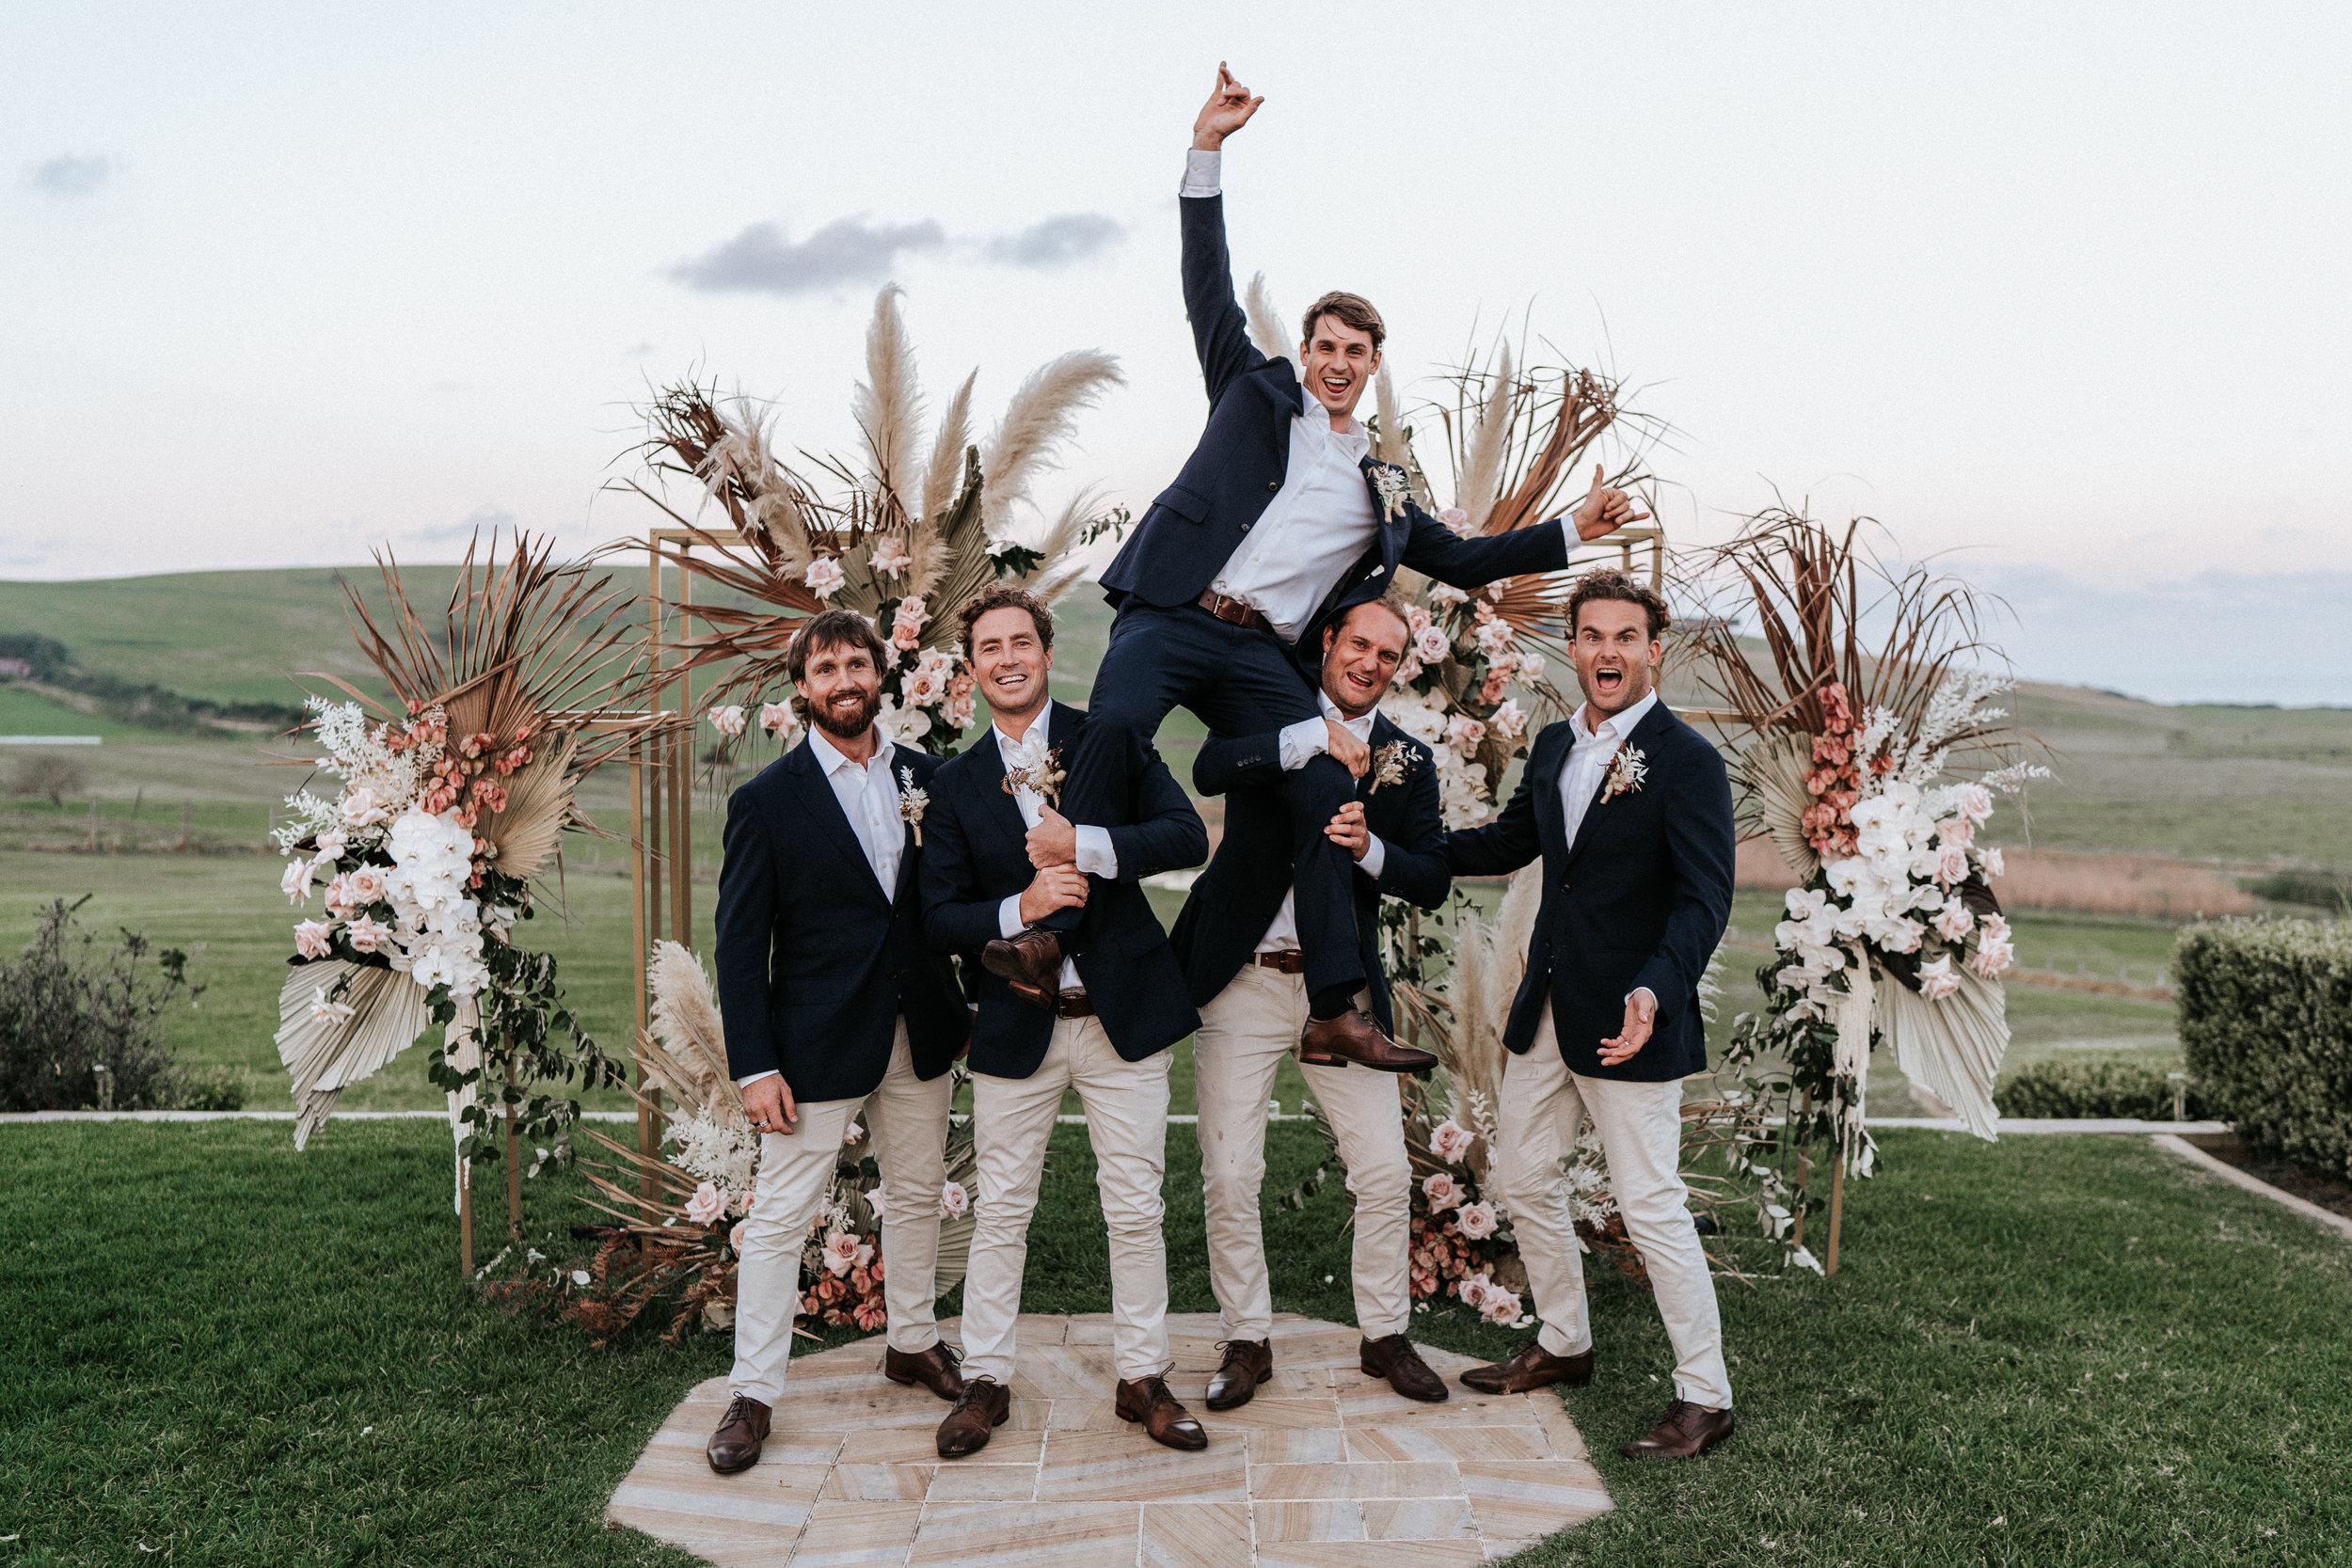 gemaya-tim-bilmon-wedding-806.jpg